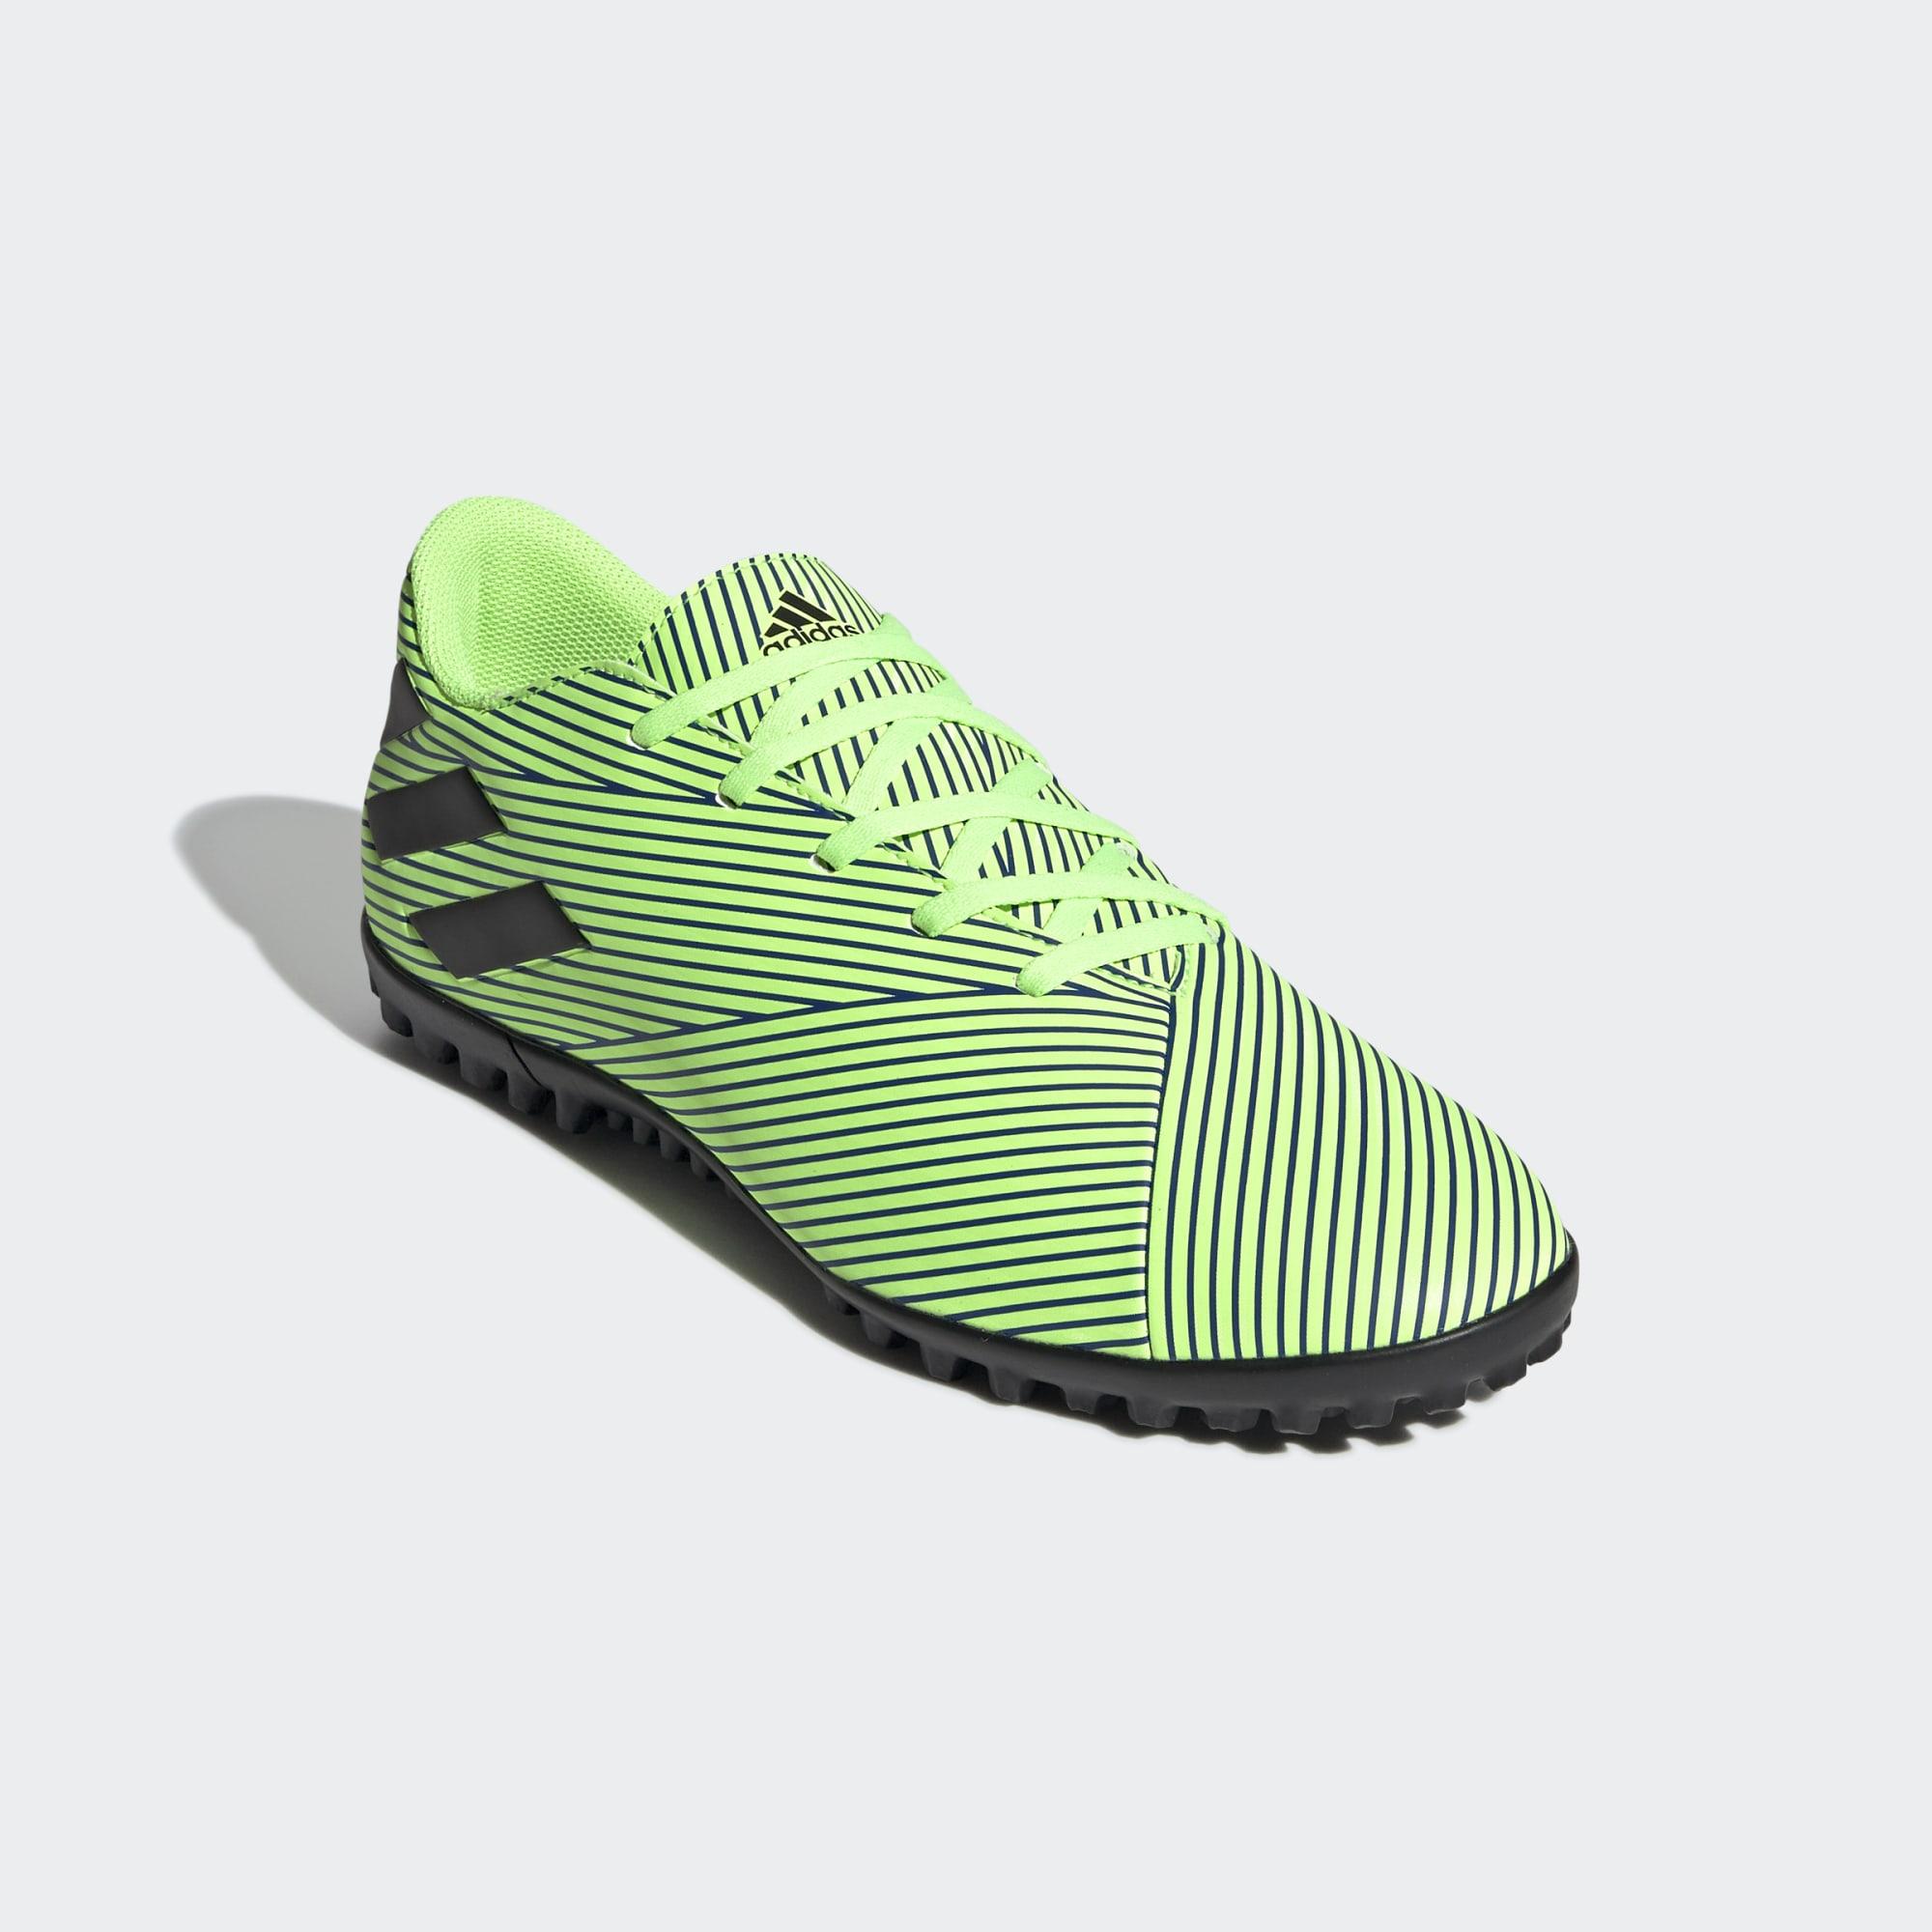 Chuteira Adidas Nemeziz 19.4 Society